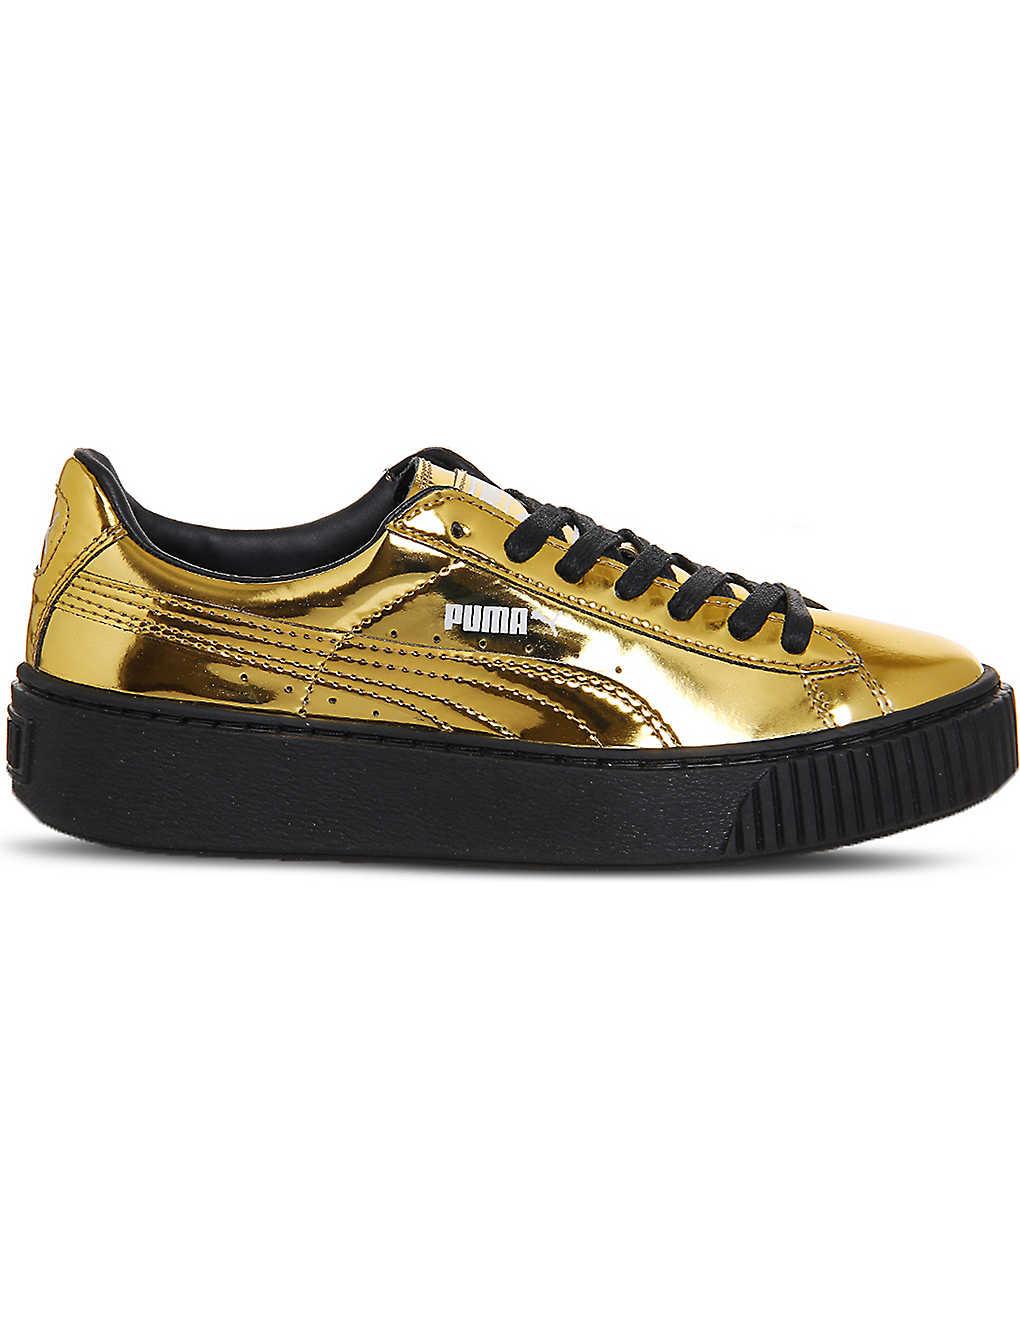 competitive price 11554 8864a PUMA - Basket platform metallic-leather trainers ...